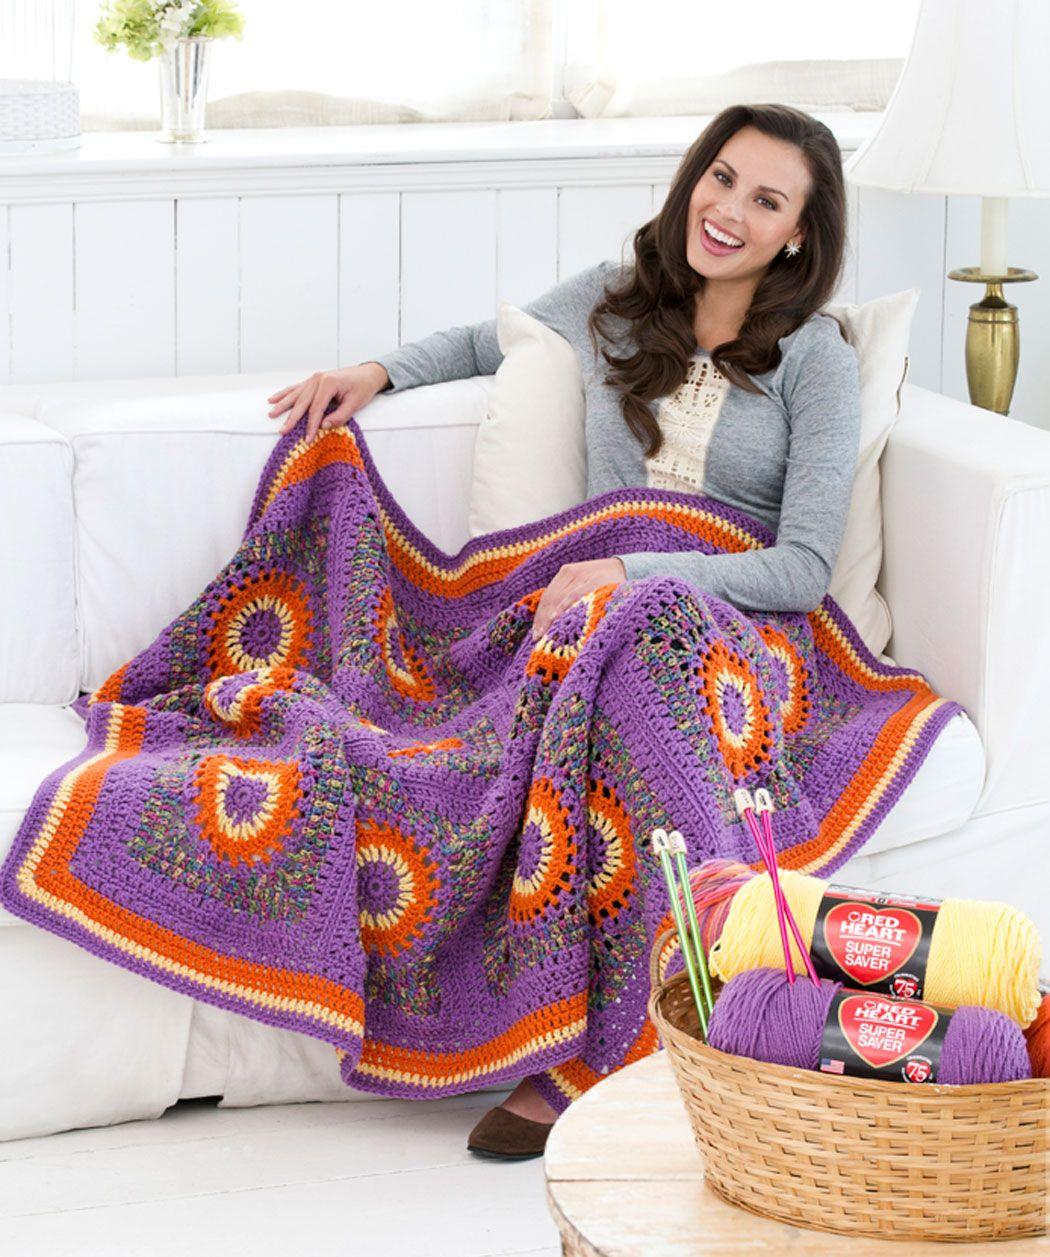 Crochet Circles Throw, free instructions. http://www.redheart.com ...